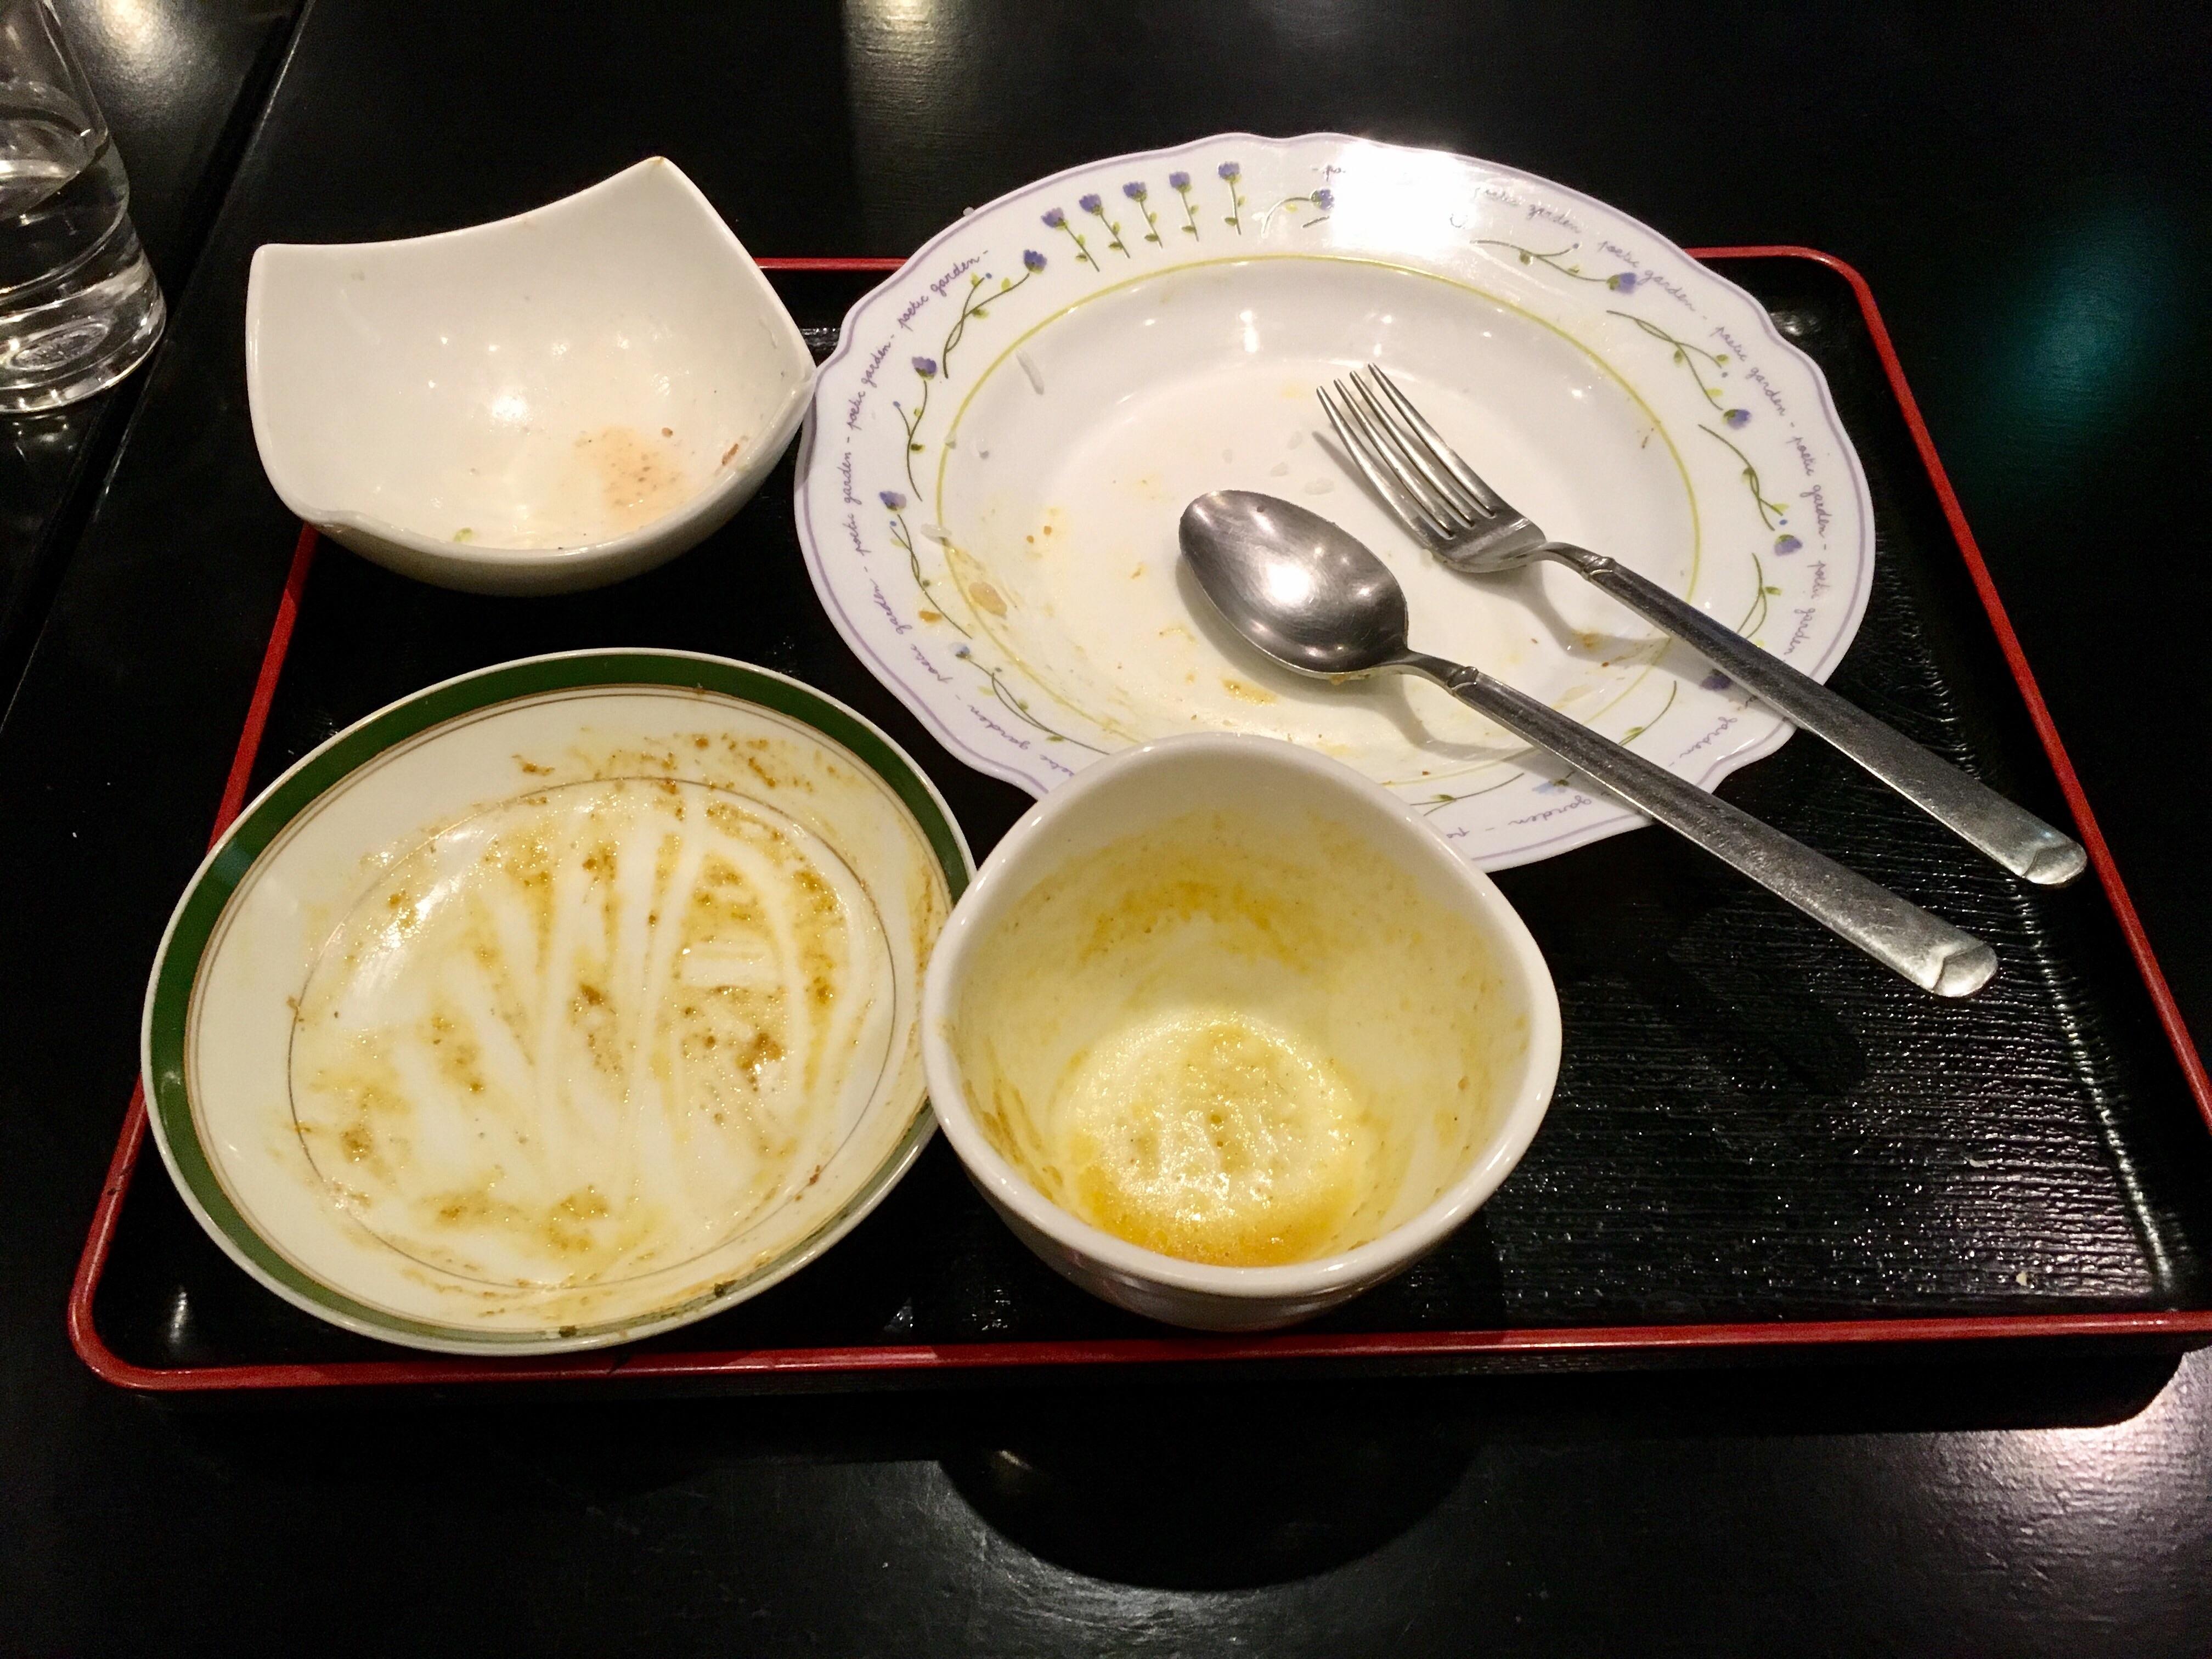 f:id:SoichiroIkeshita:20170124003734j:image